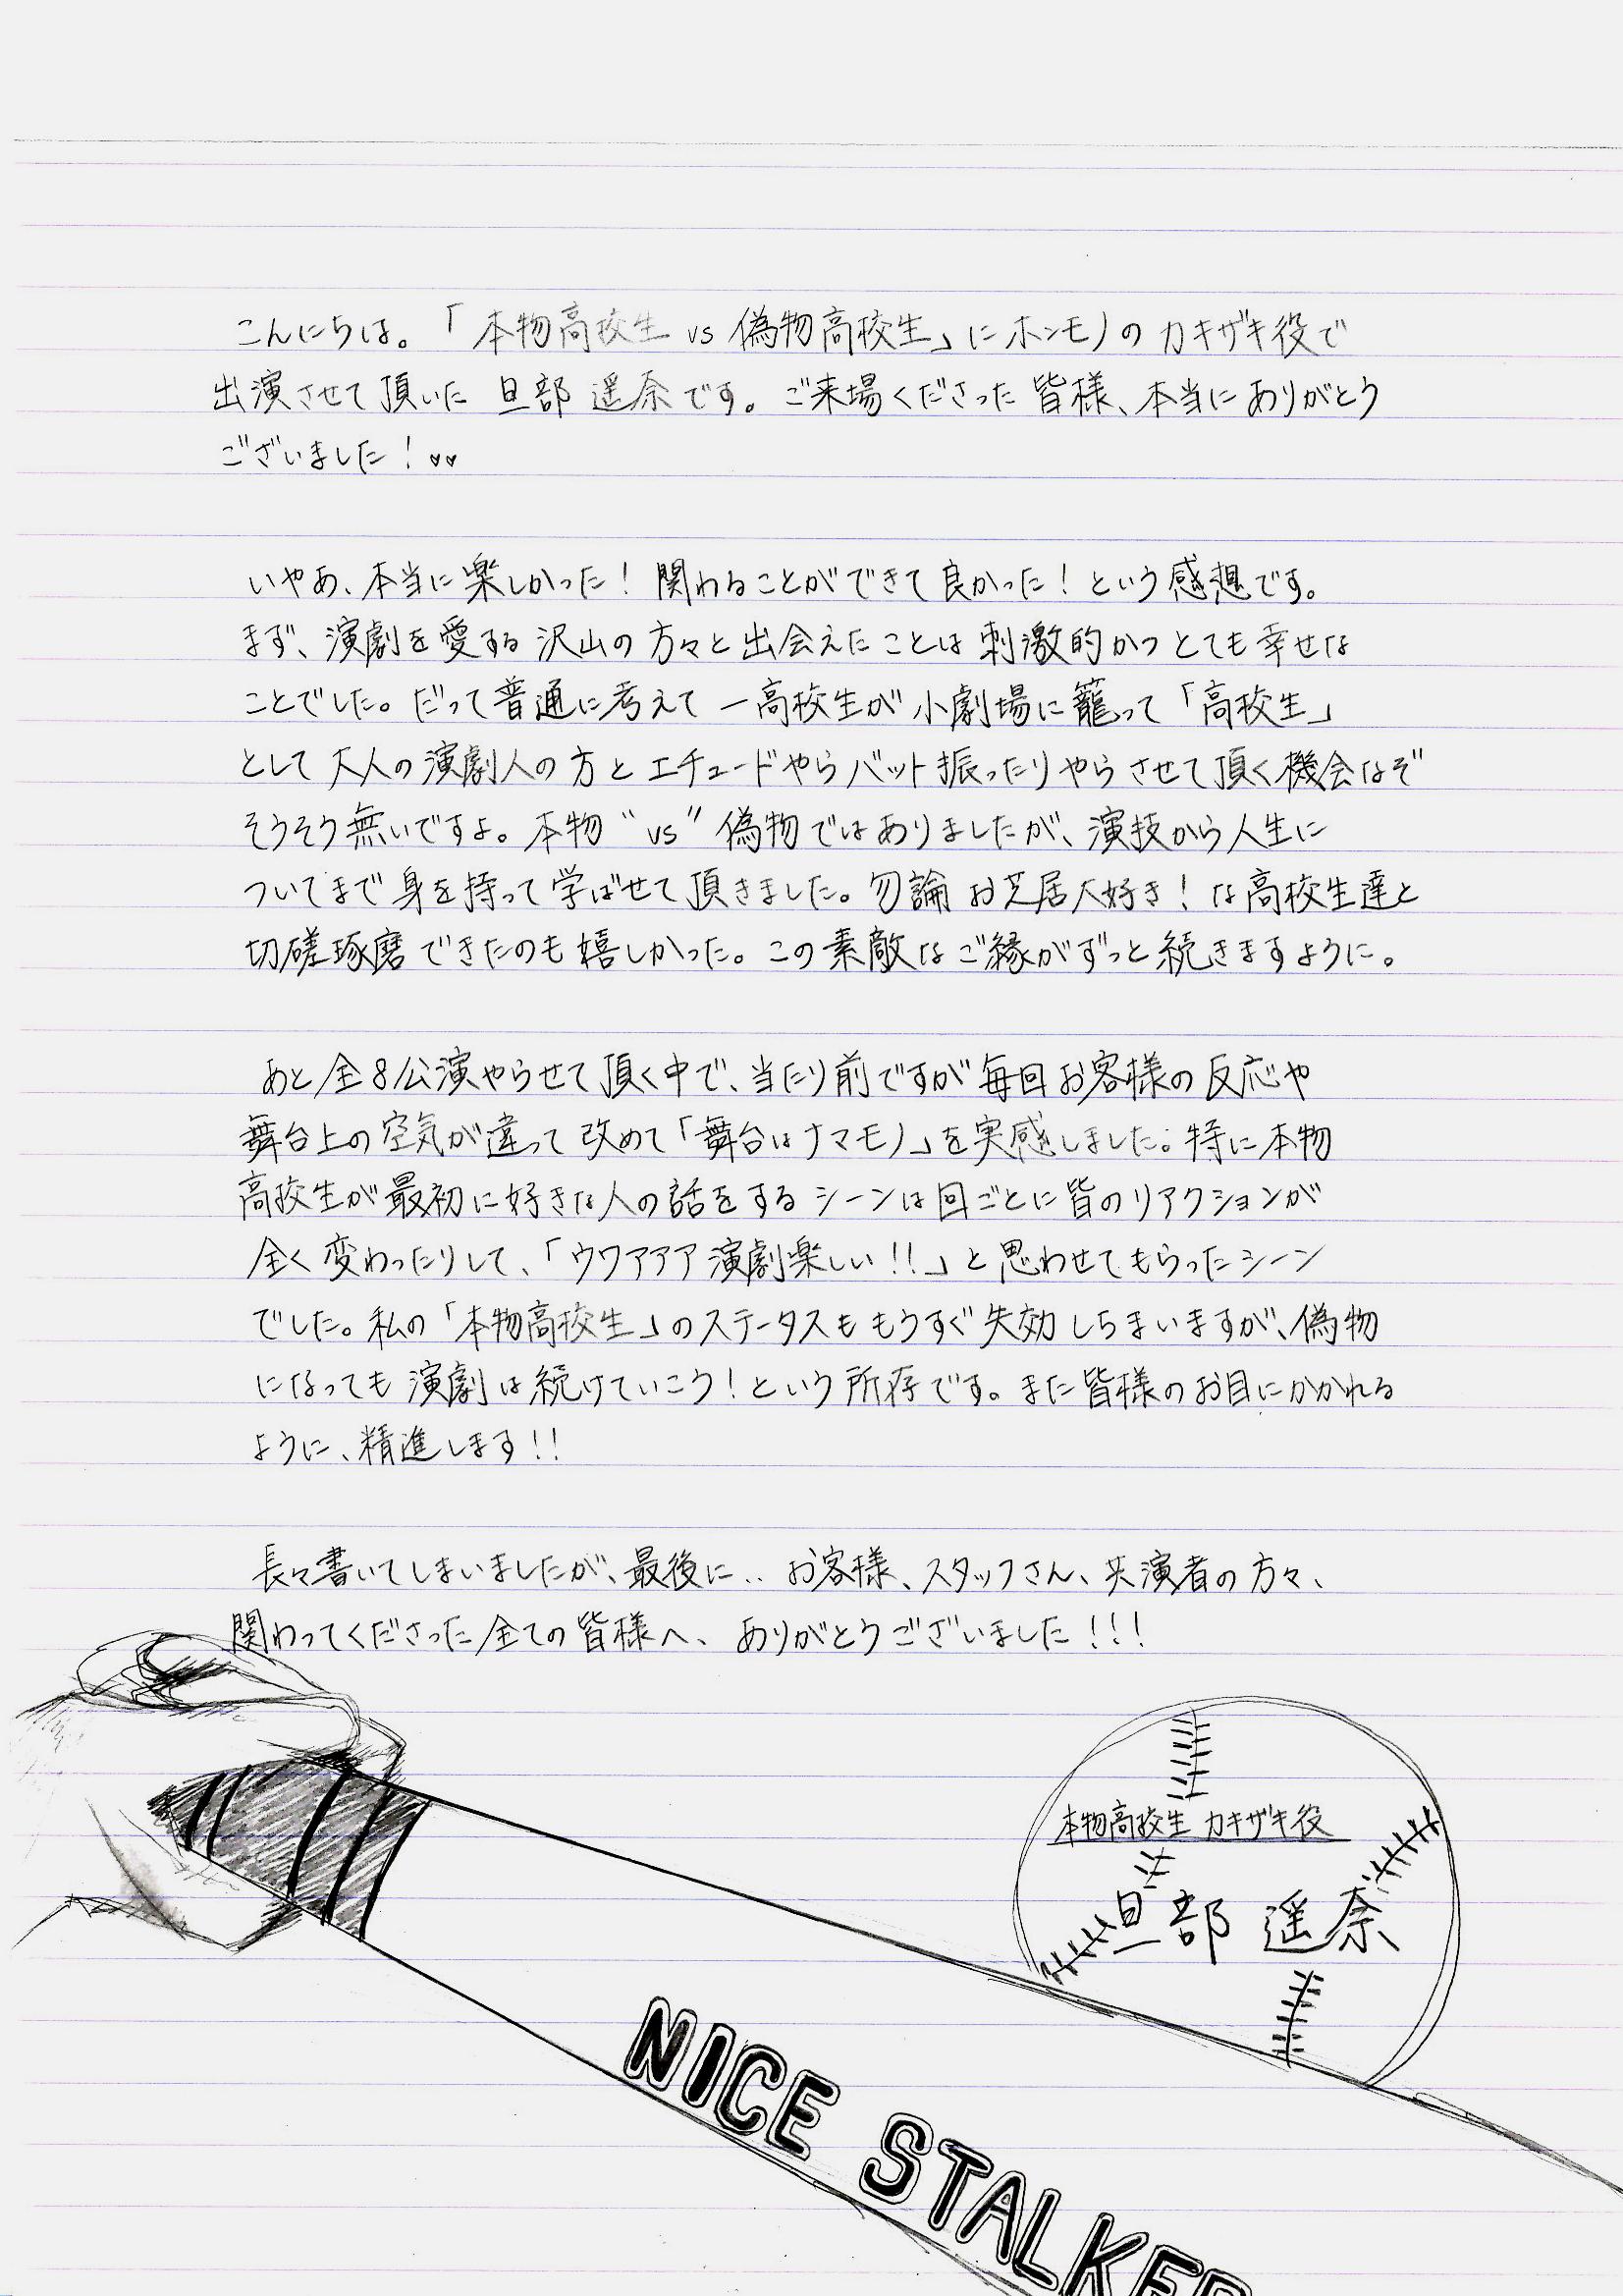 旦部_EPSON001_revice